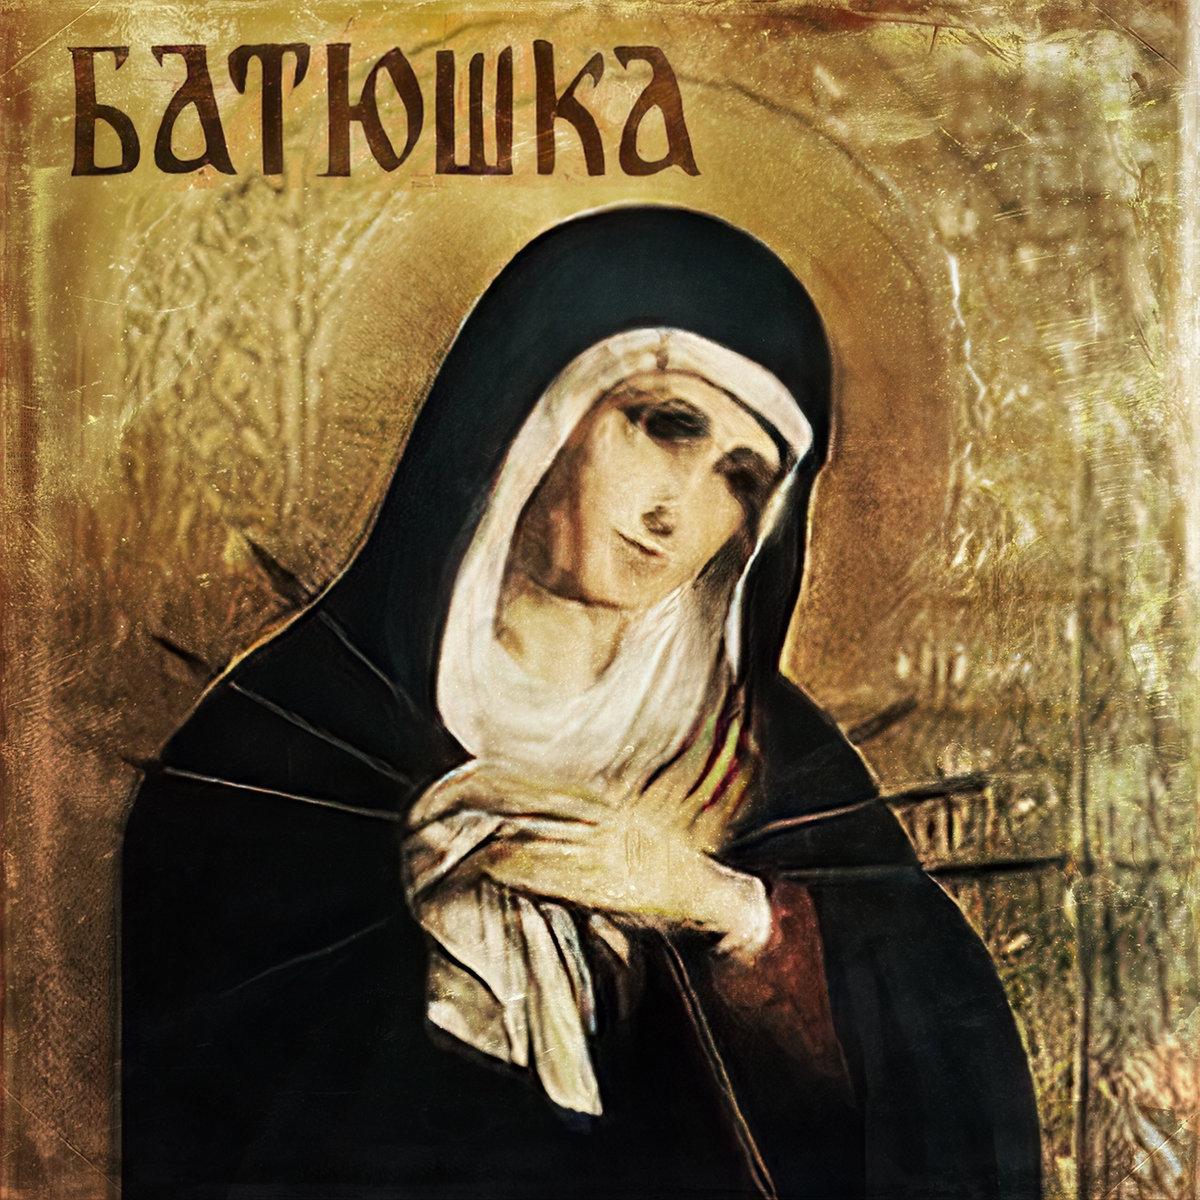 batyshka